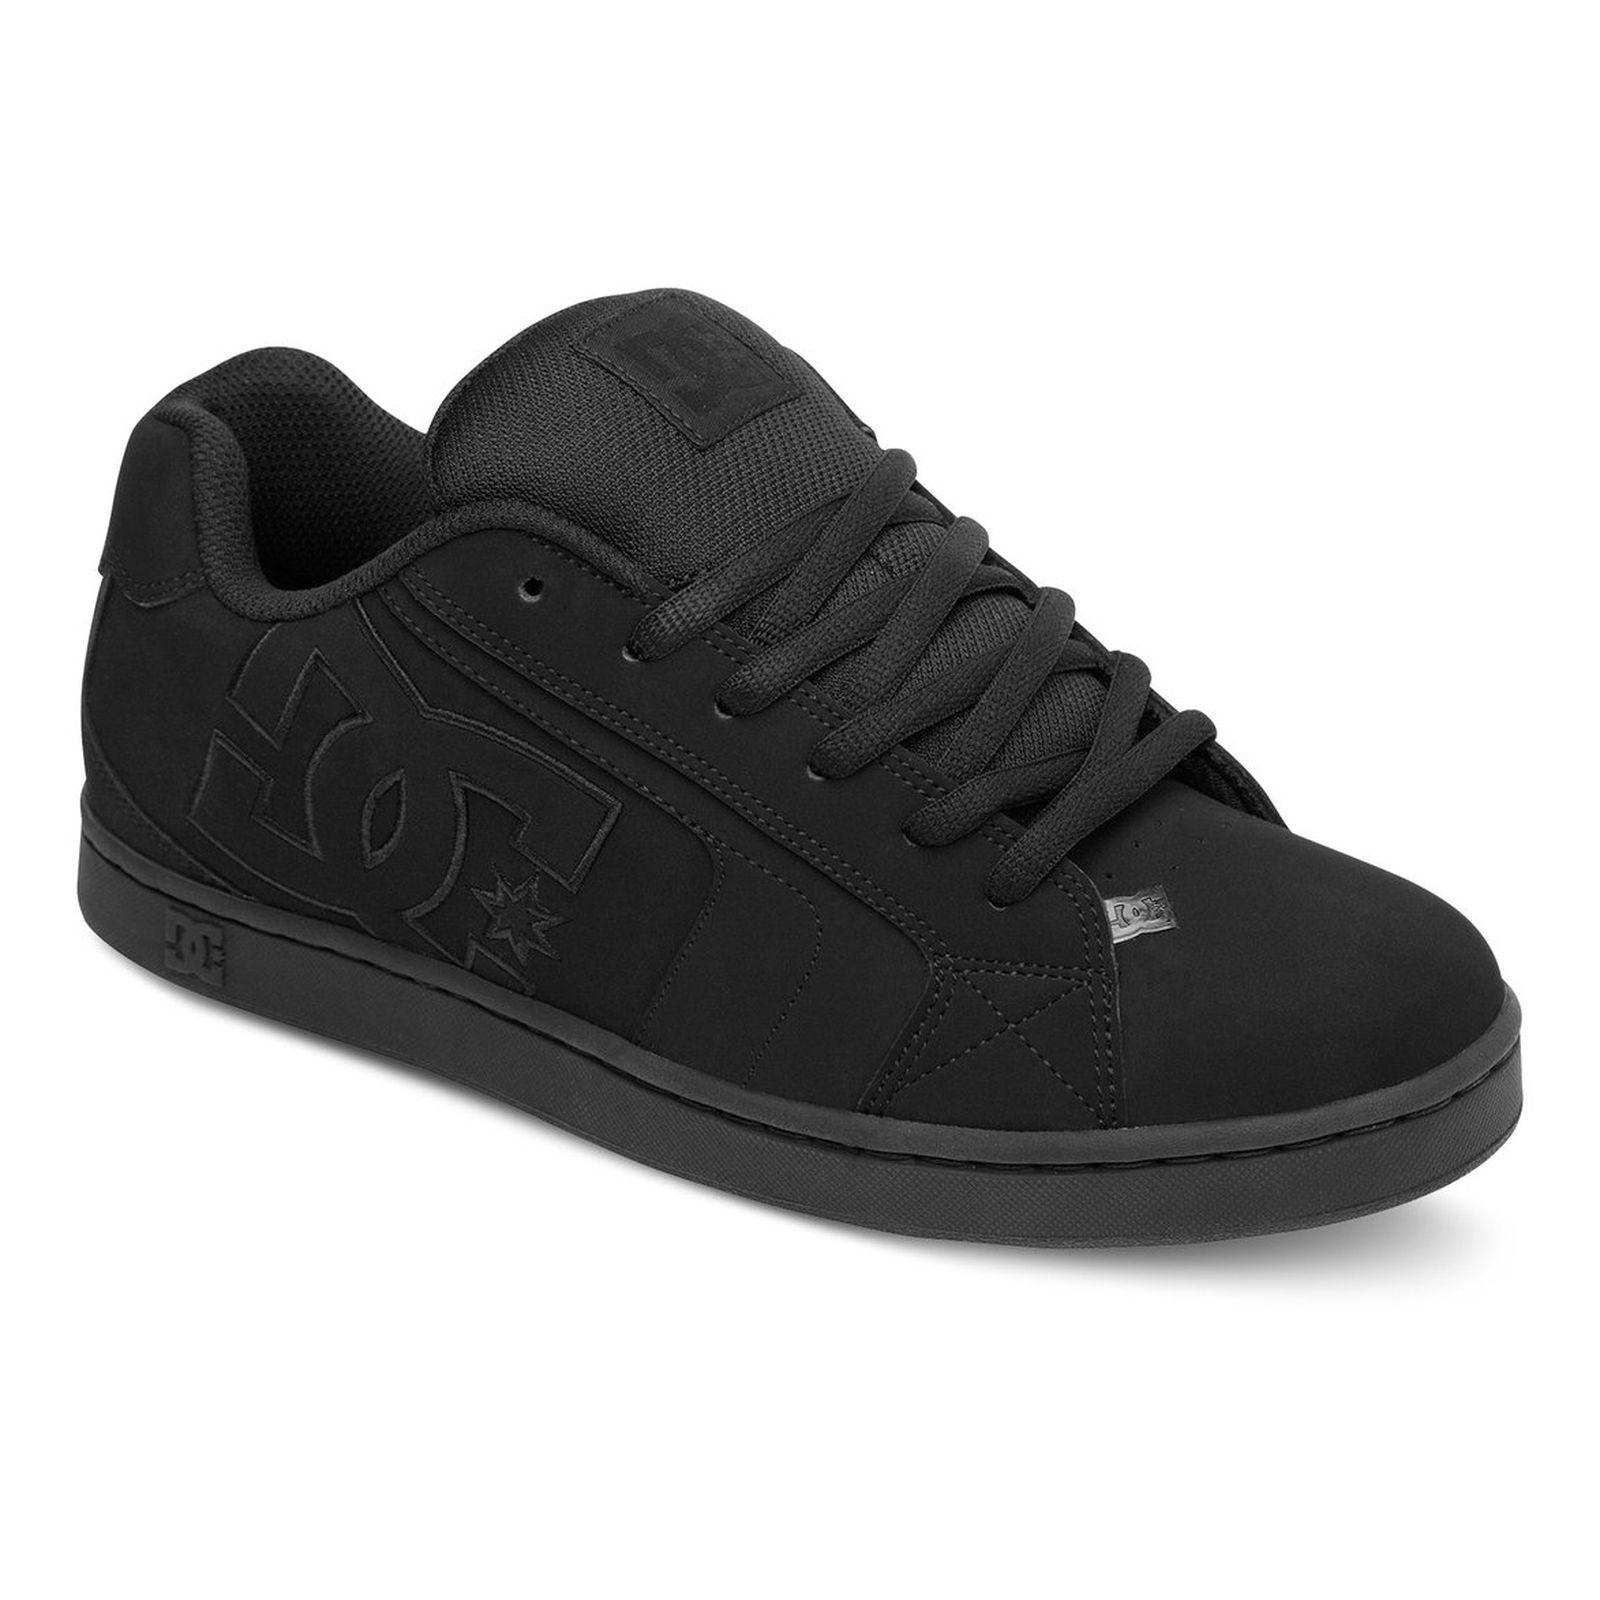 DC Mens Net Skate Shoes - Black Black Black